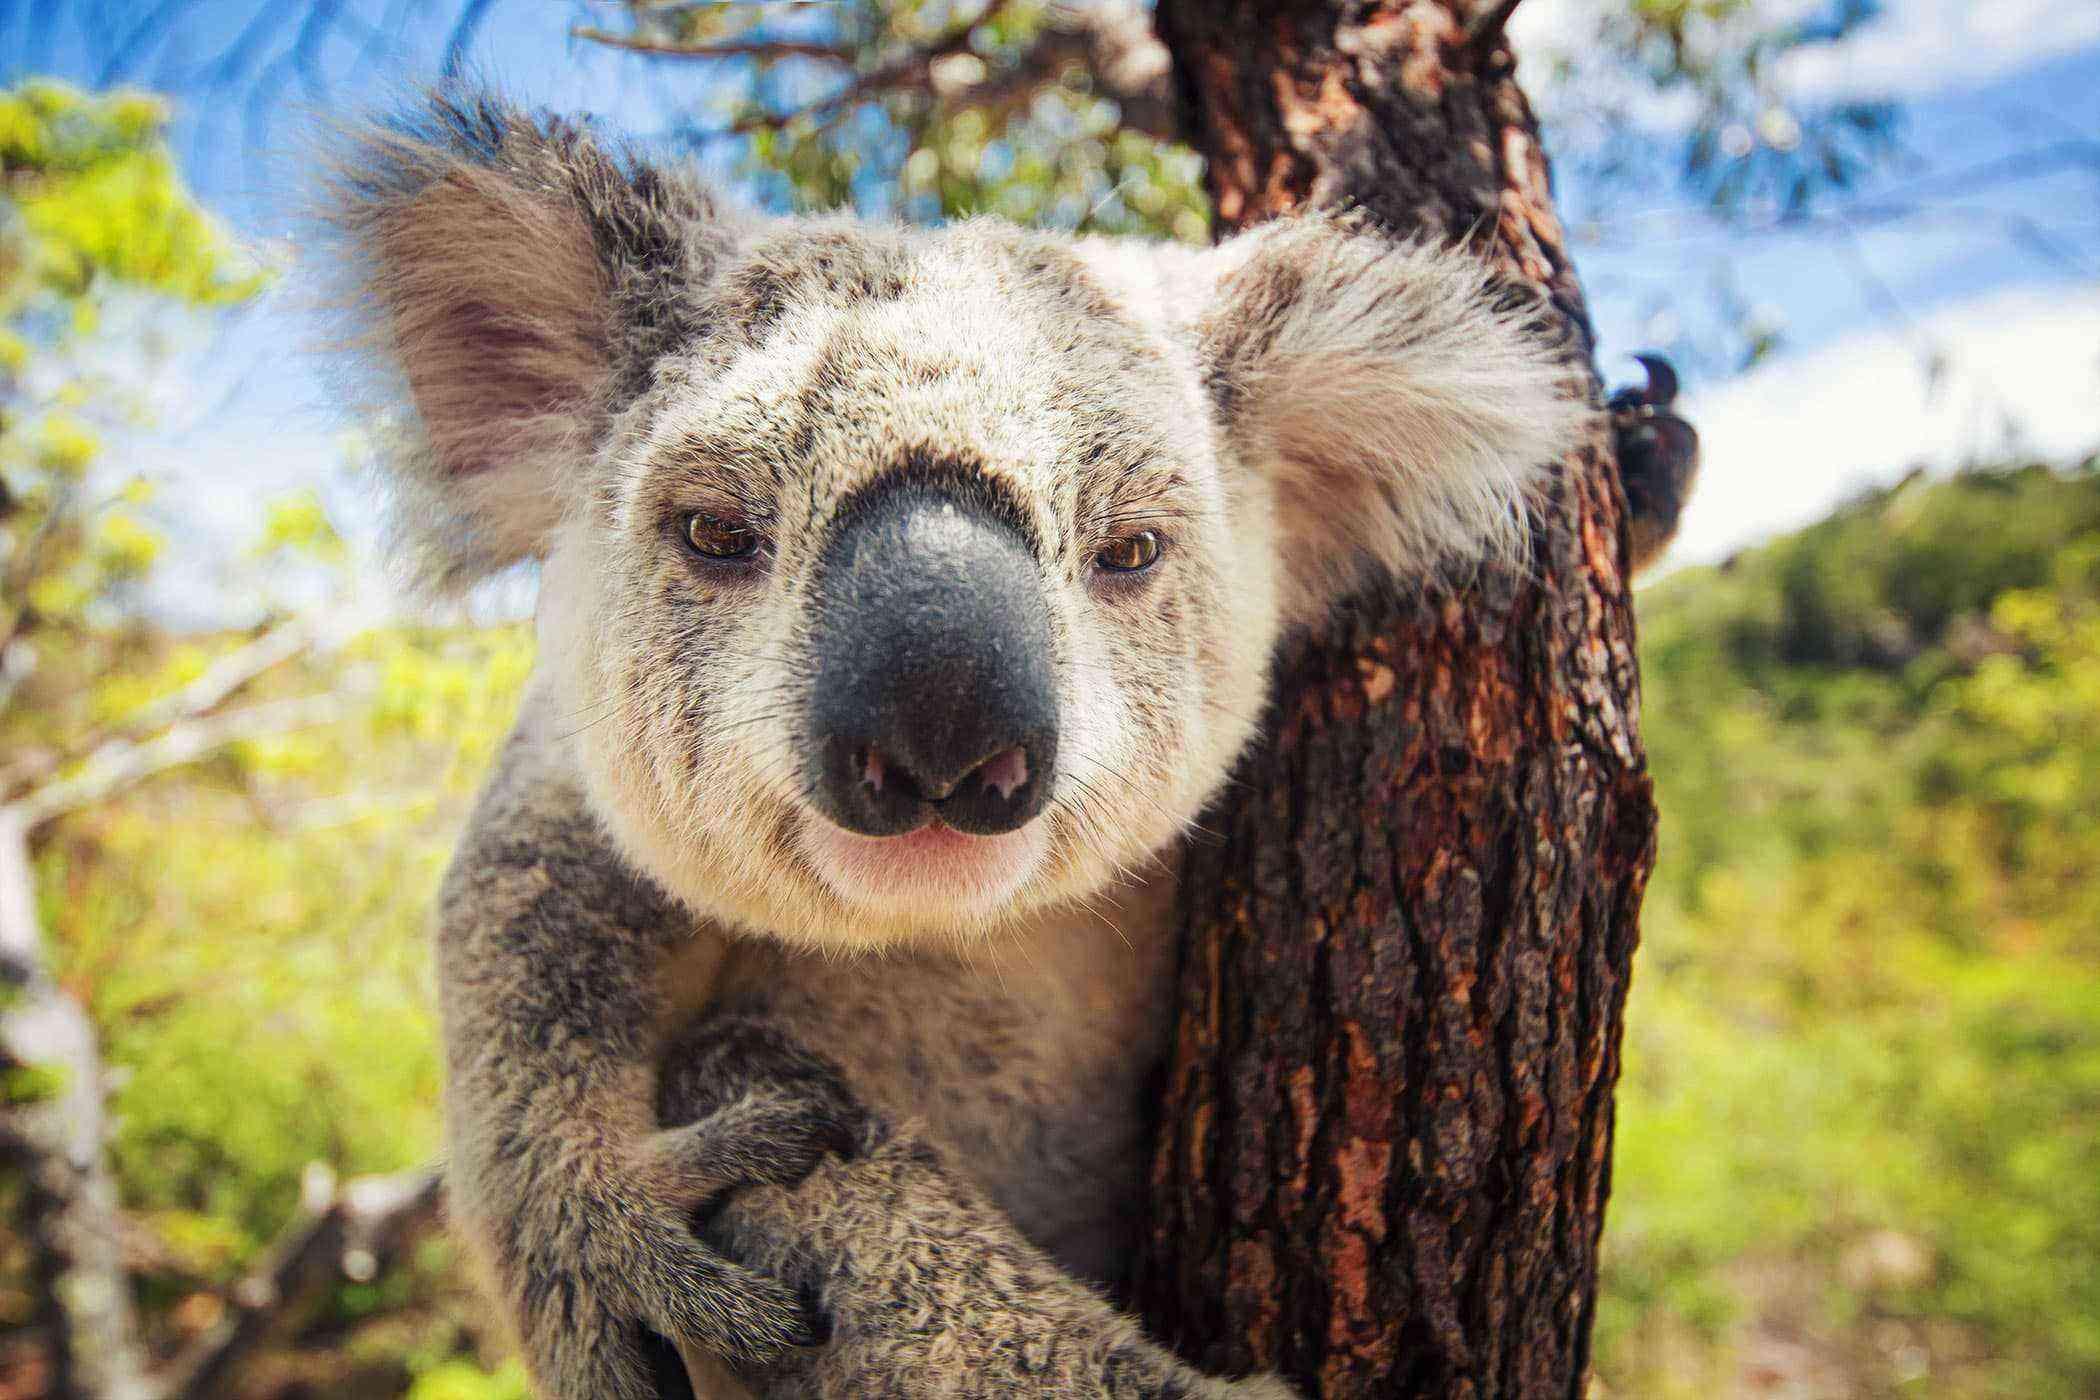 koala australian wildlife animals australia bear climate koalas help strange change looking english byron bay 80km clinging survives hit ride